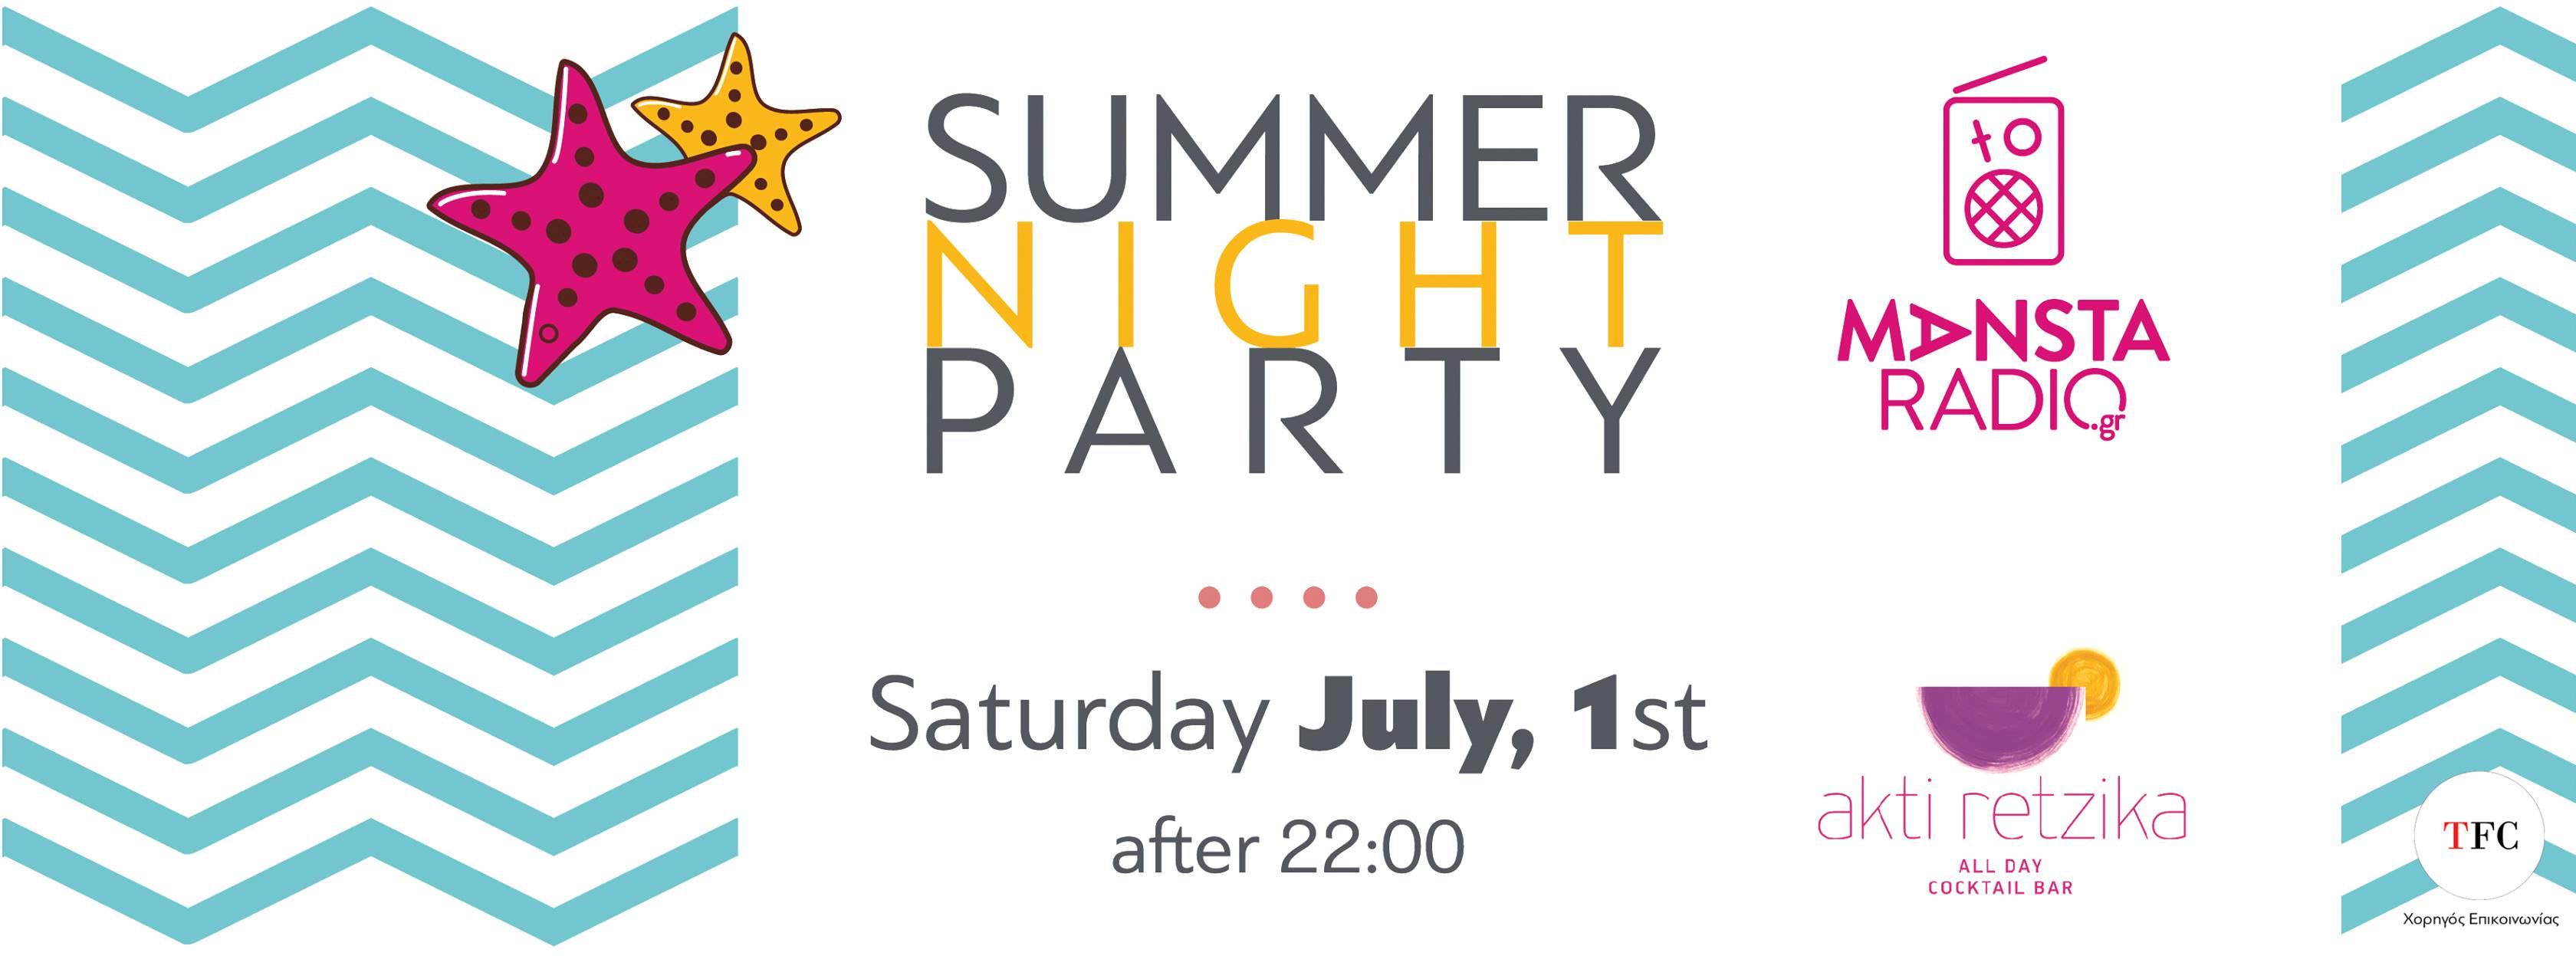 Mansta Radio Summer Night Party at Akti Retzika, Saturday 1 July